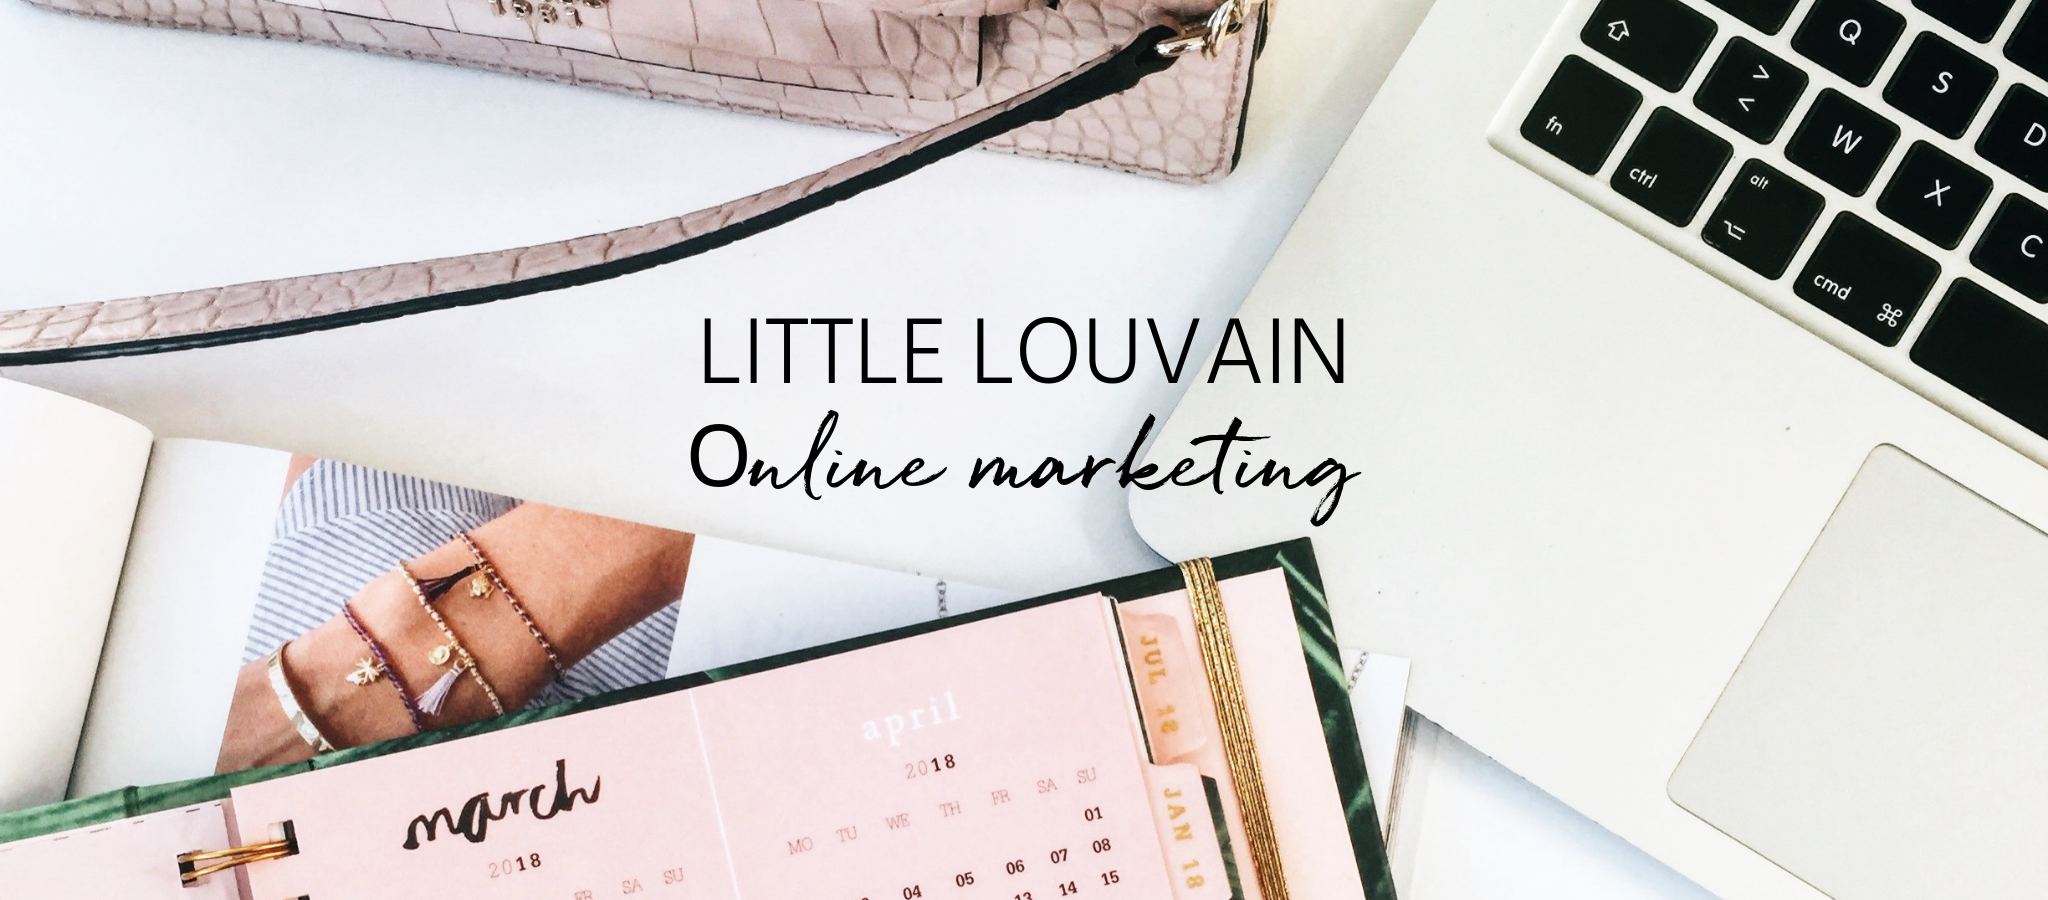 Littlelouvain online marketing